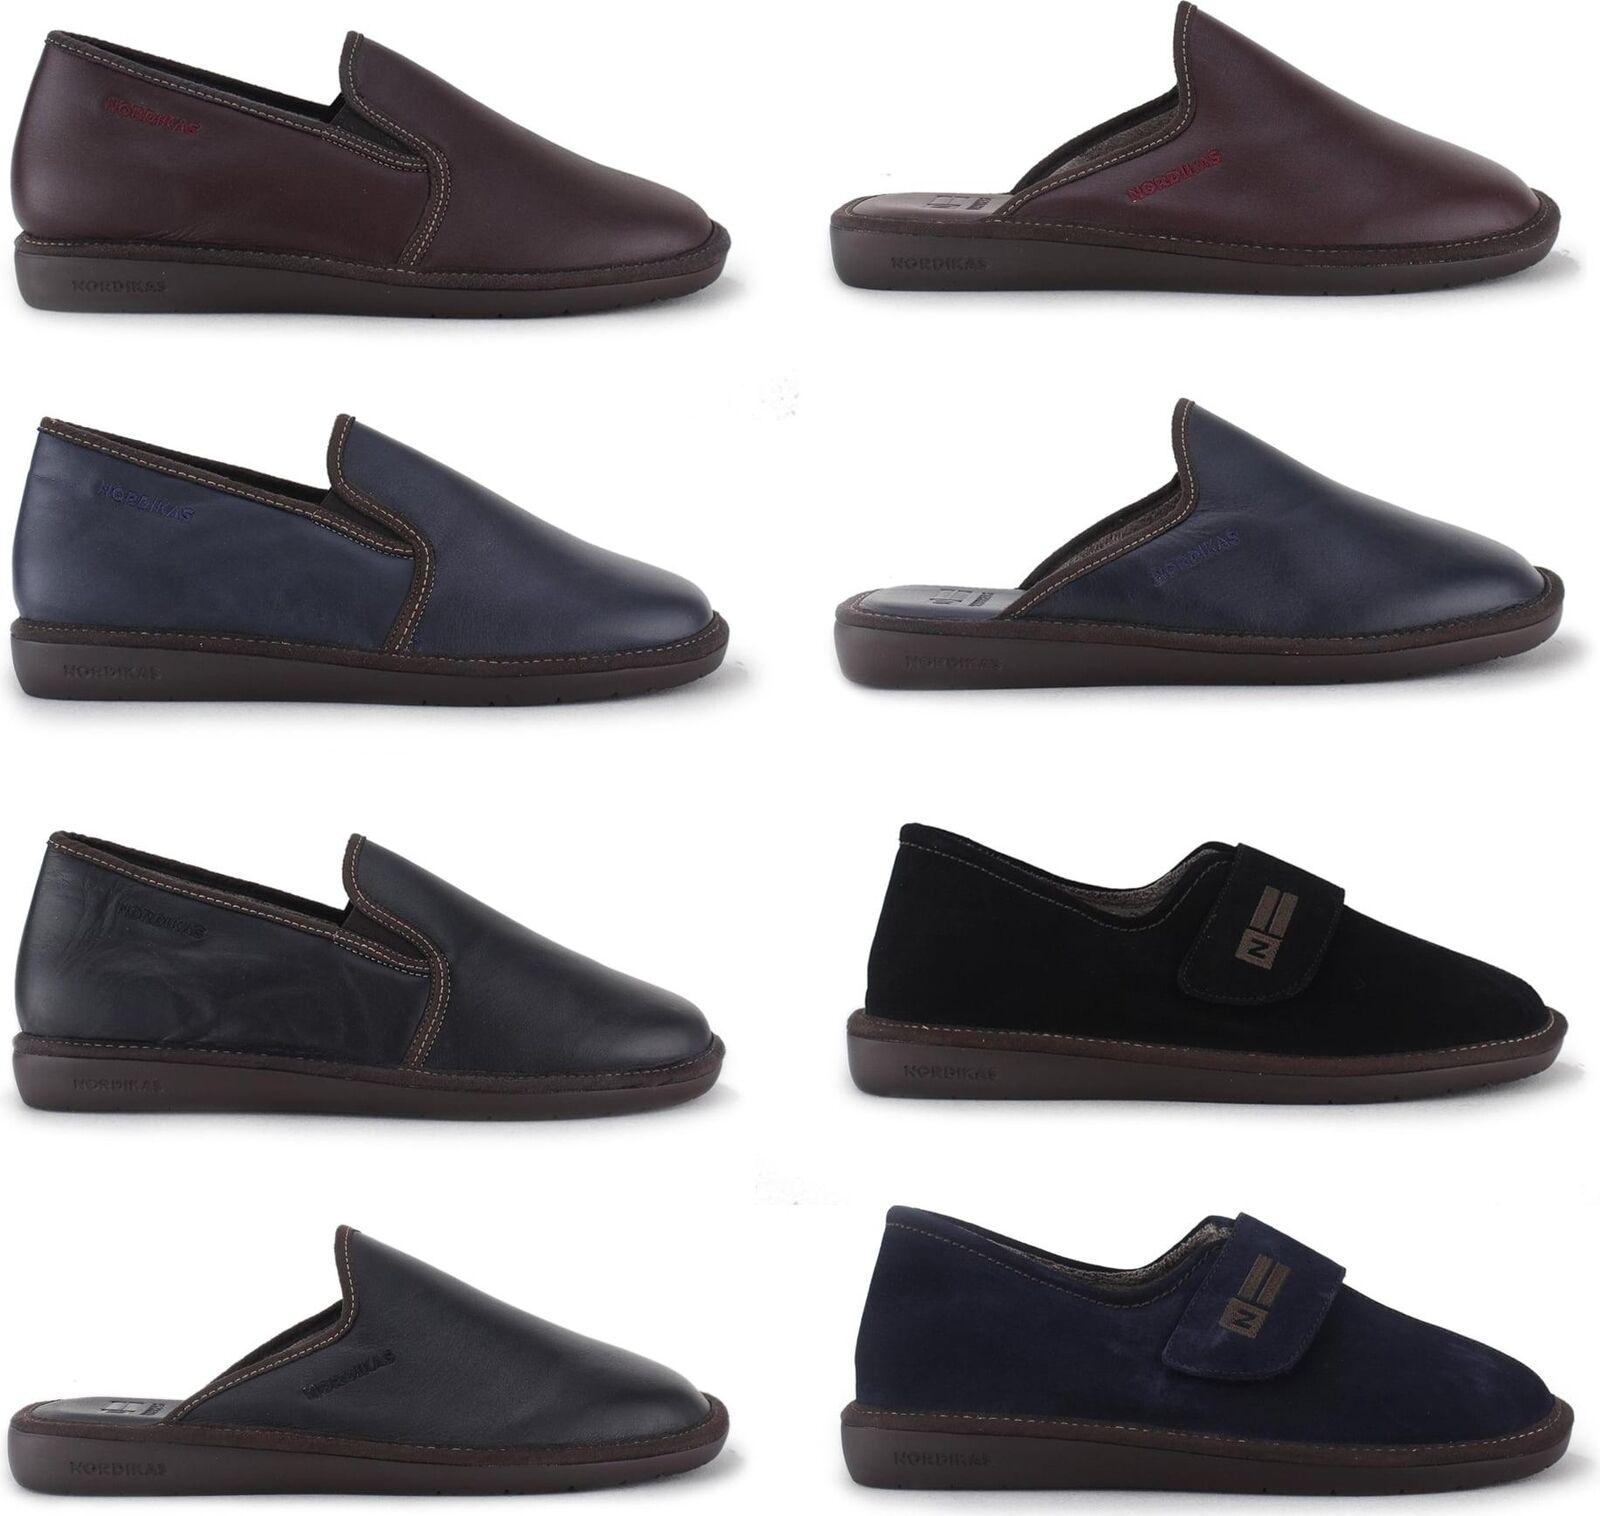 Nordikas 131 663 374 Mens Luxury Soft Genuine Leather Suede Comfort Slippers